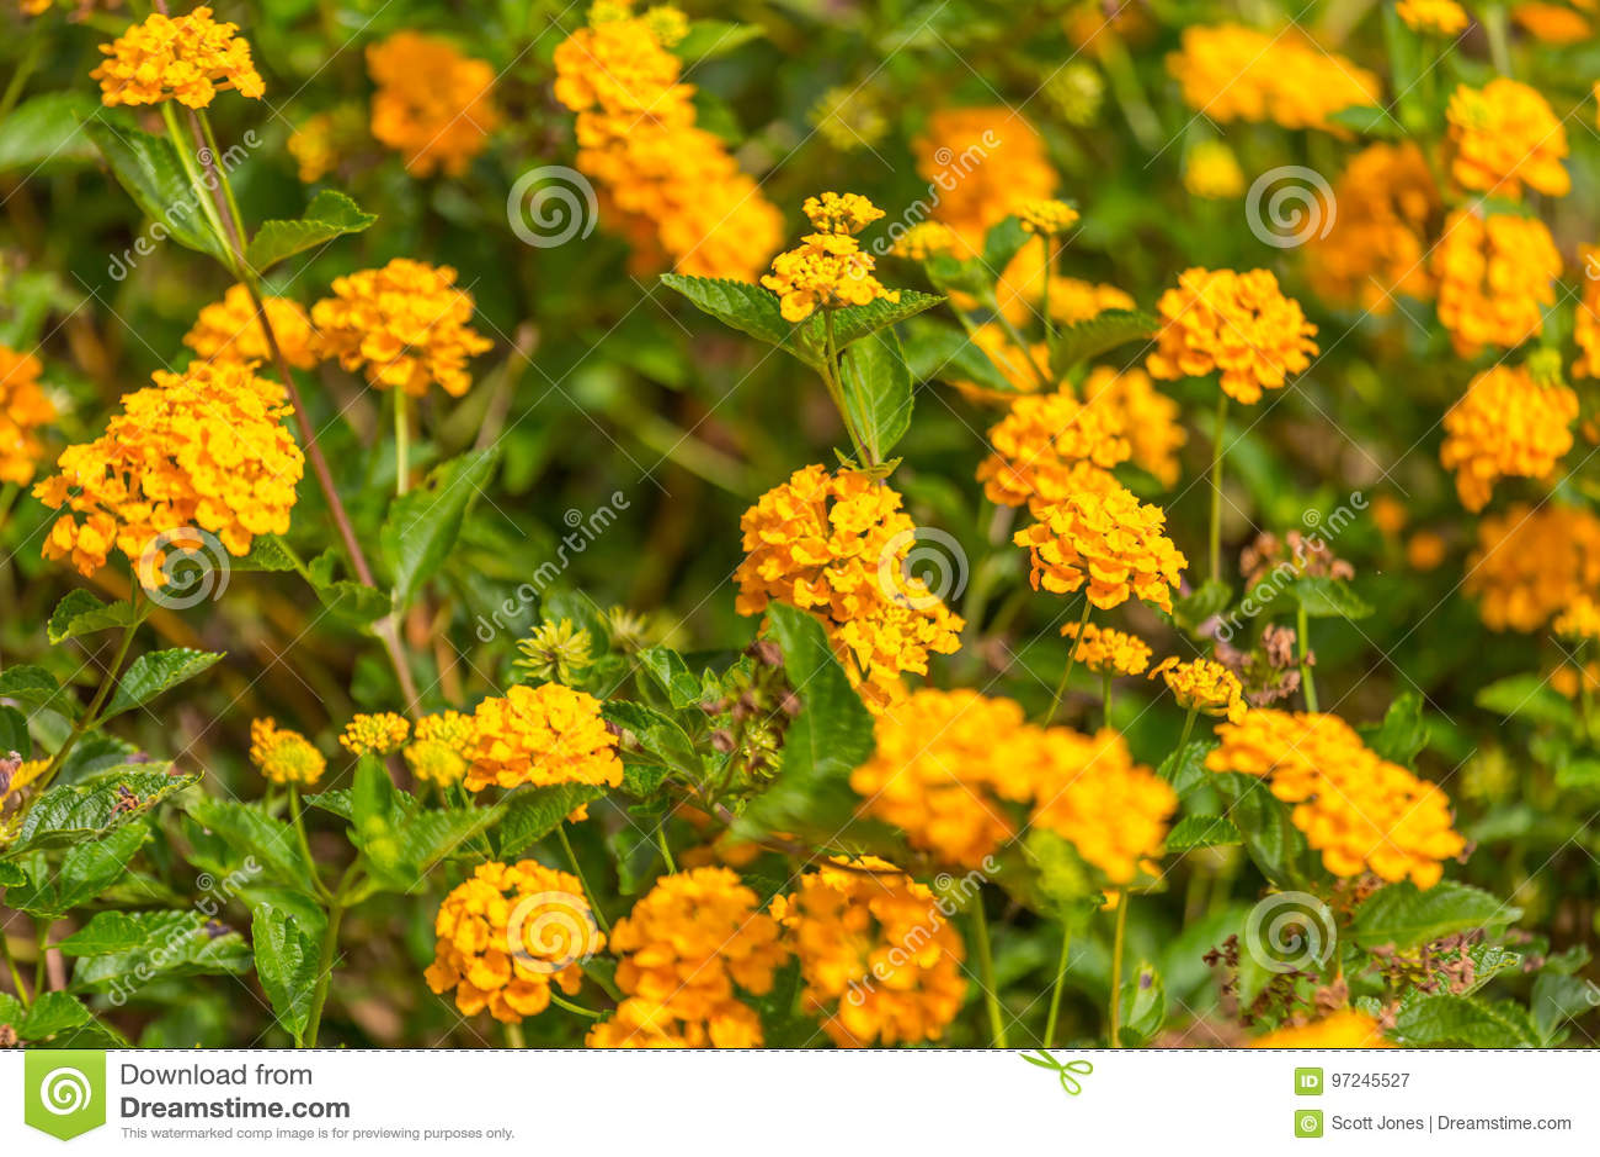 Creeping Lantana Stock Image Image Of Spread Grass 97245527